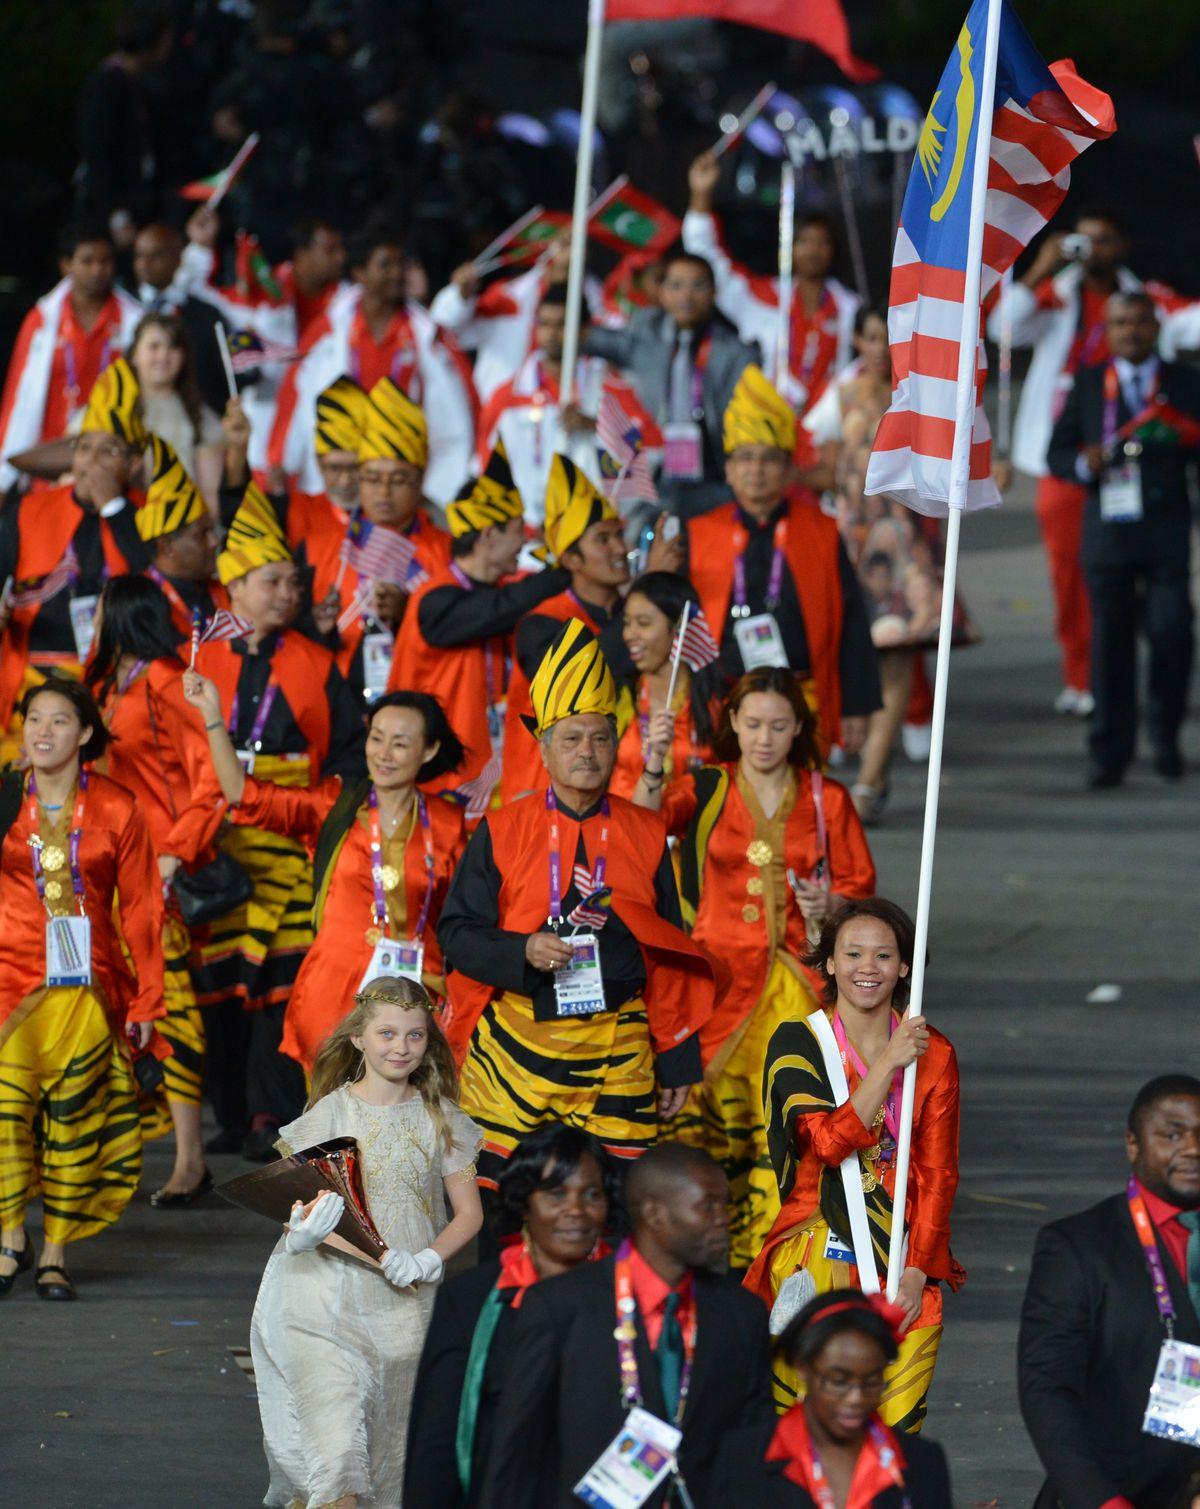 Malaysia's flagbearer Pandelela Rinong P